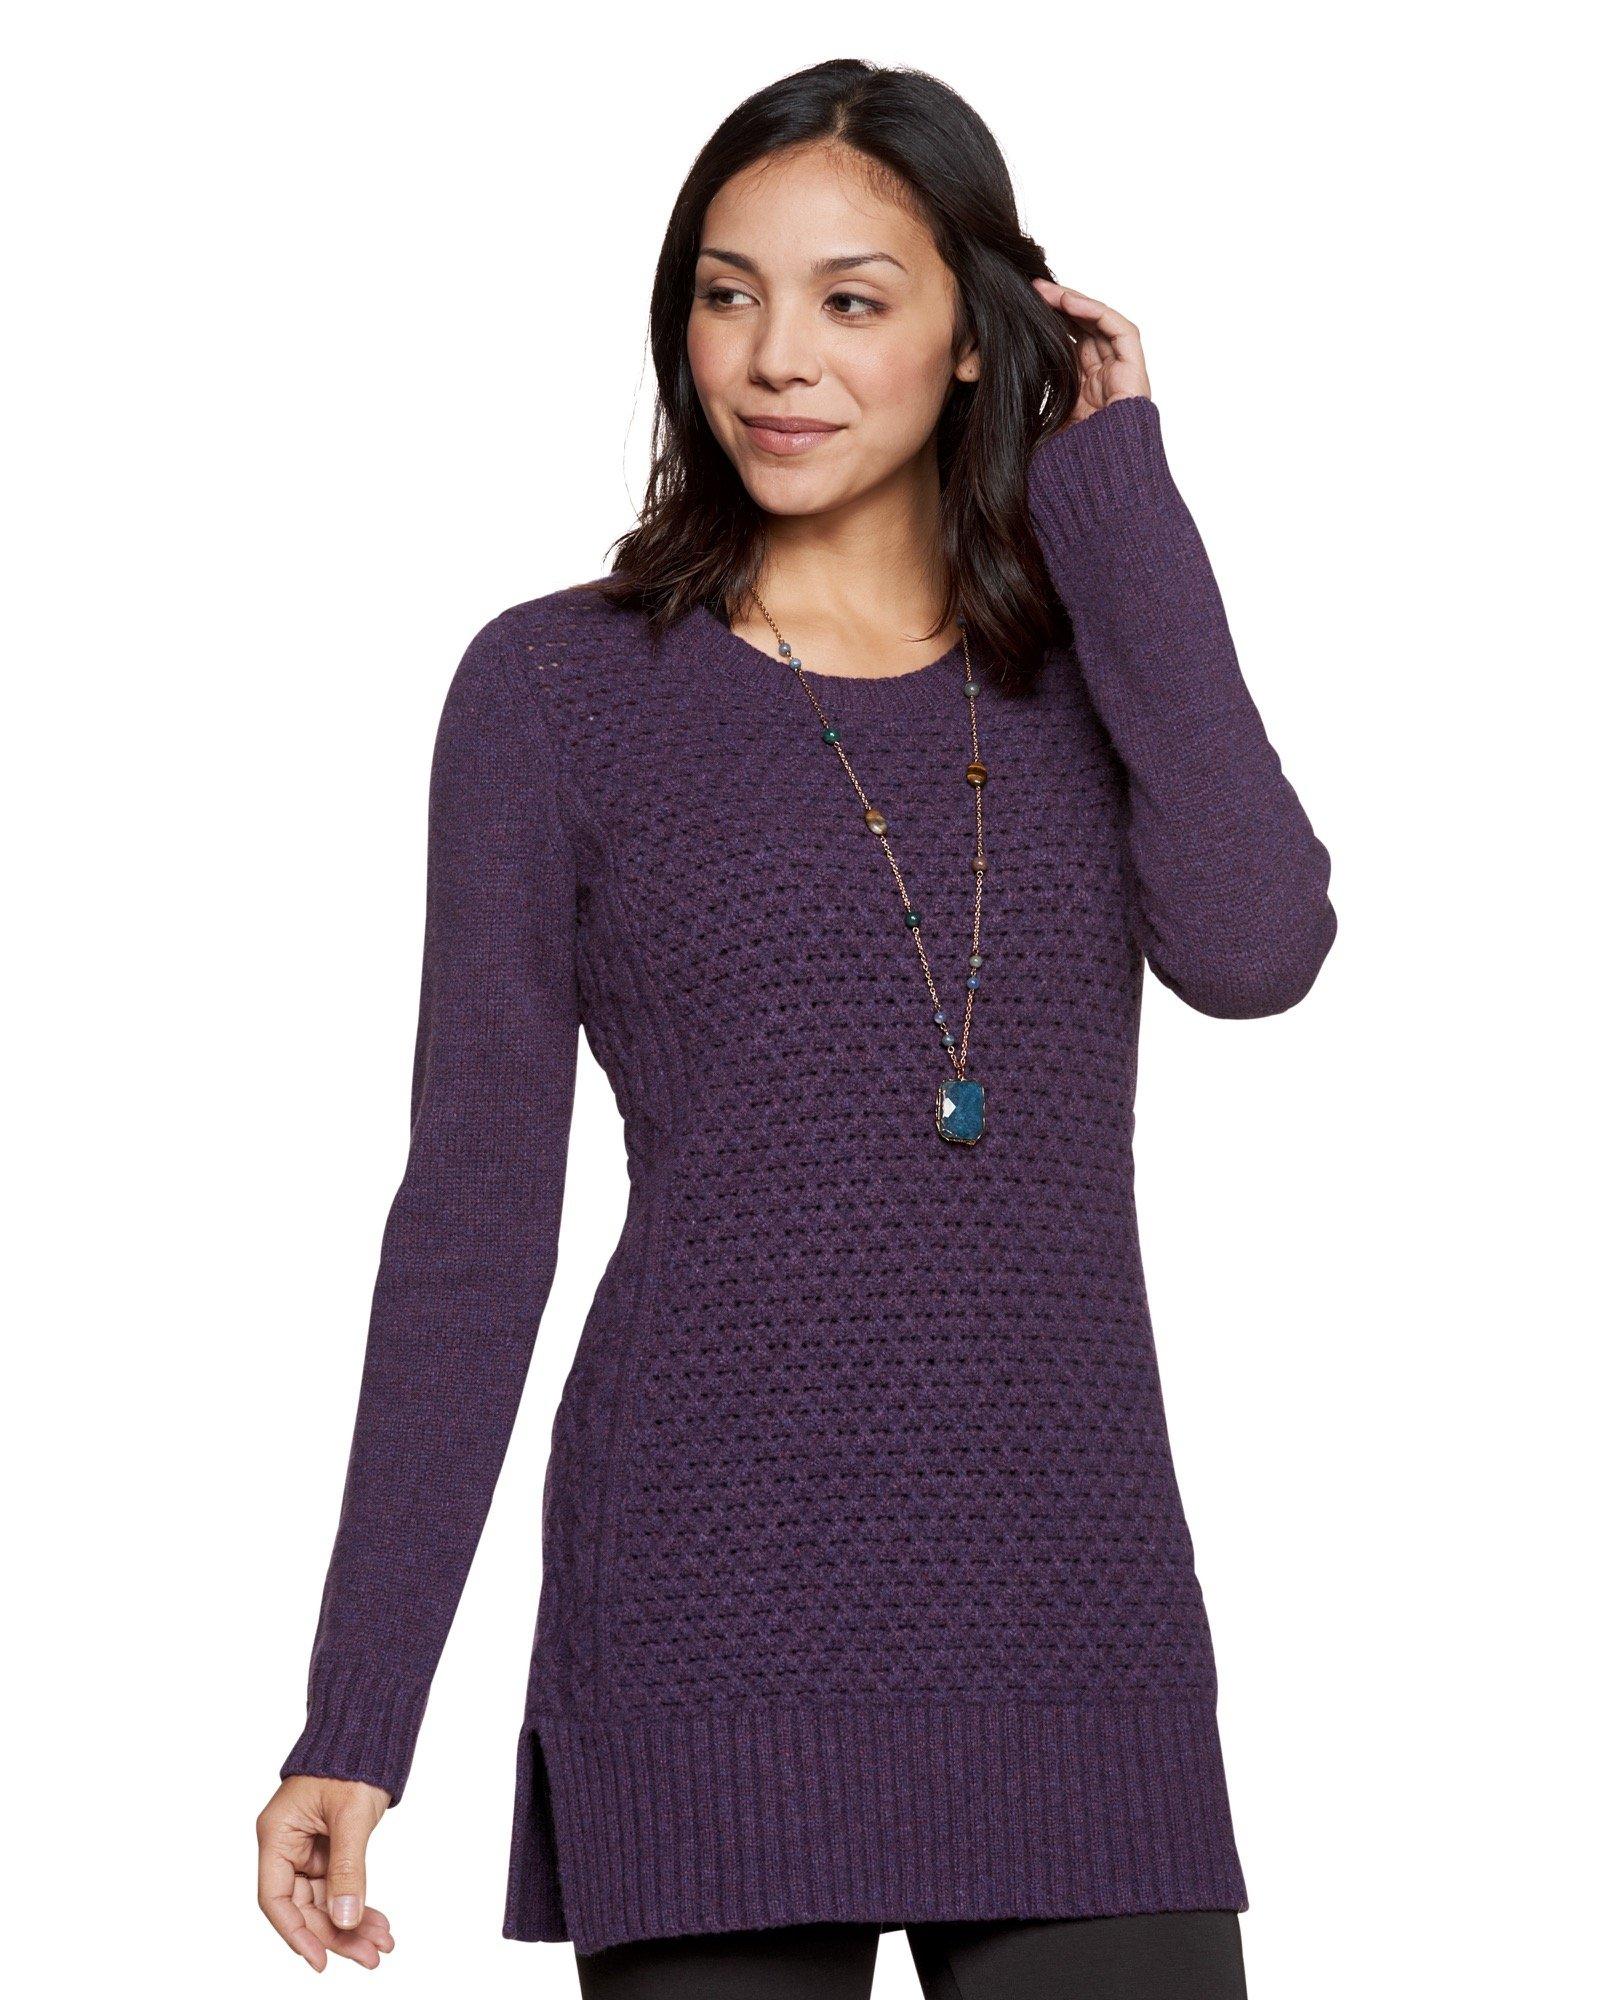 Toad&Co Women's Kintail Sweater Tunic, Nightshade, Medium